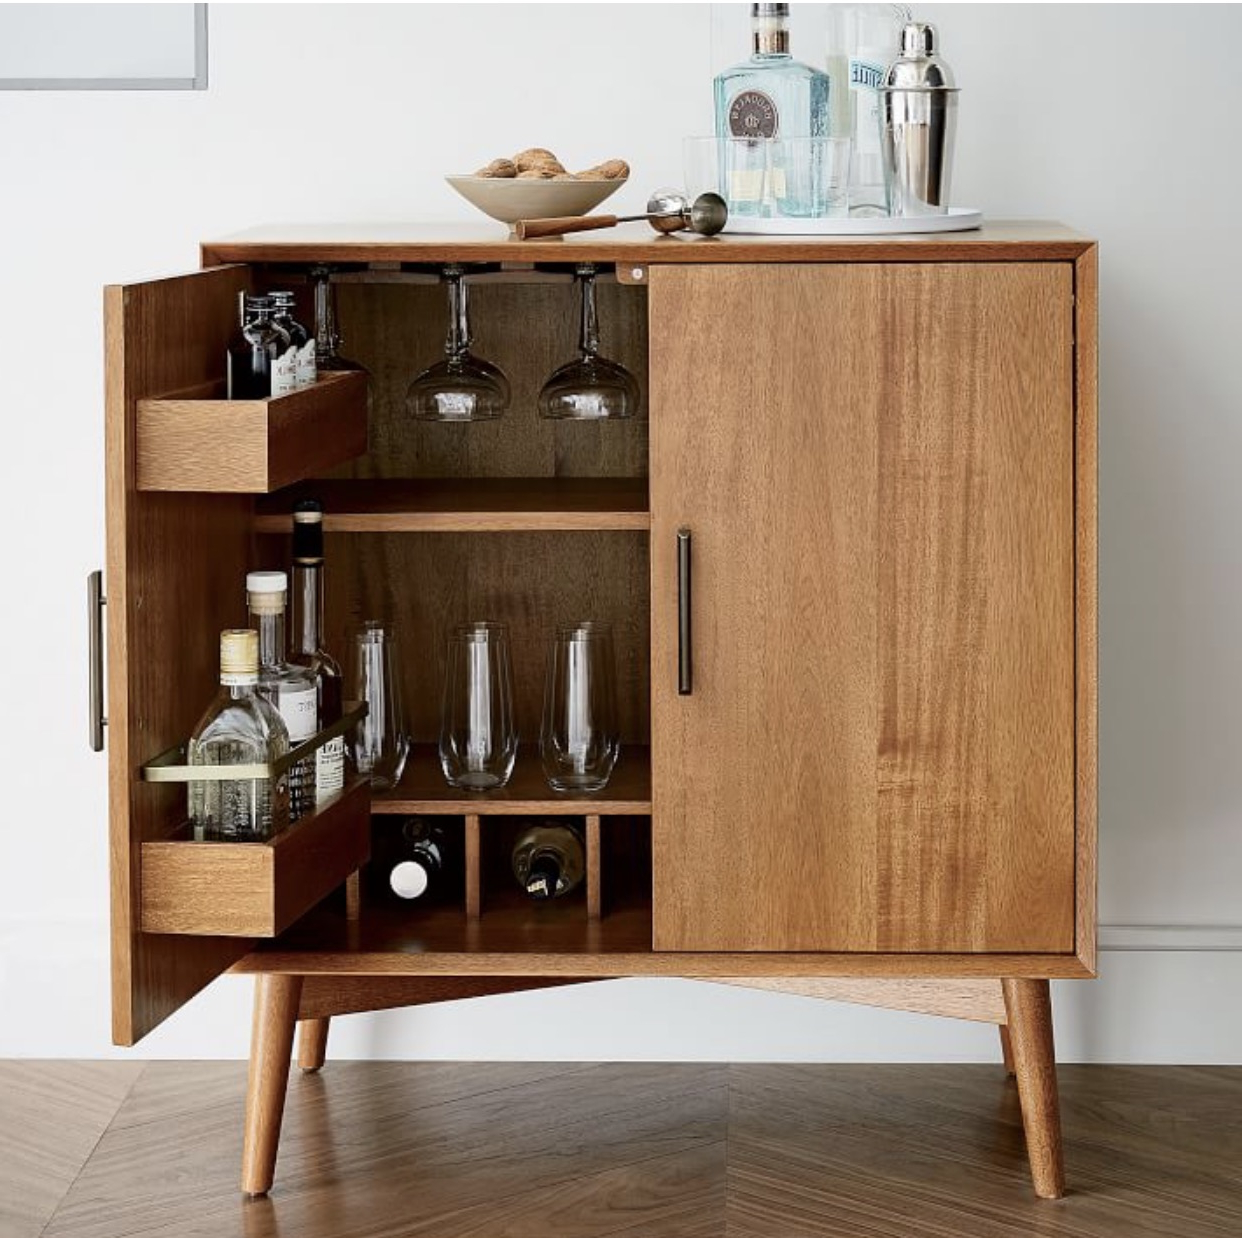 Muebles Bar H9d9 Consejos Para Tener El Mueble Bar Perfecto Decoradores E